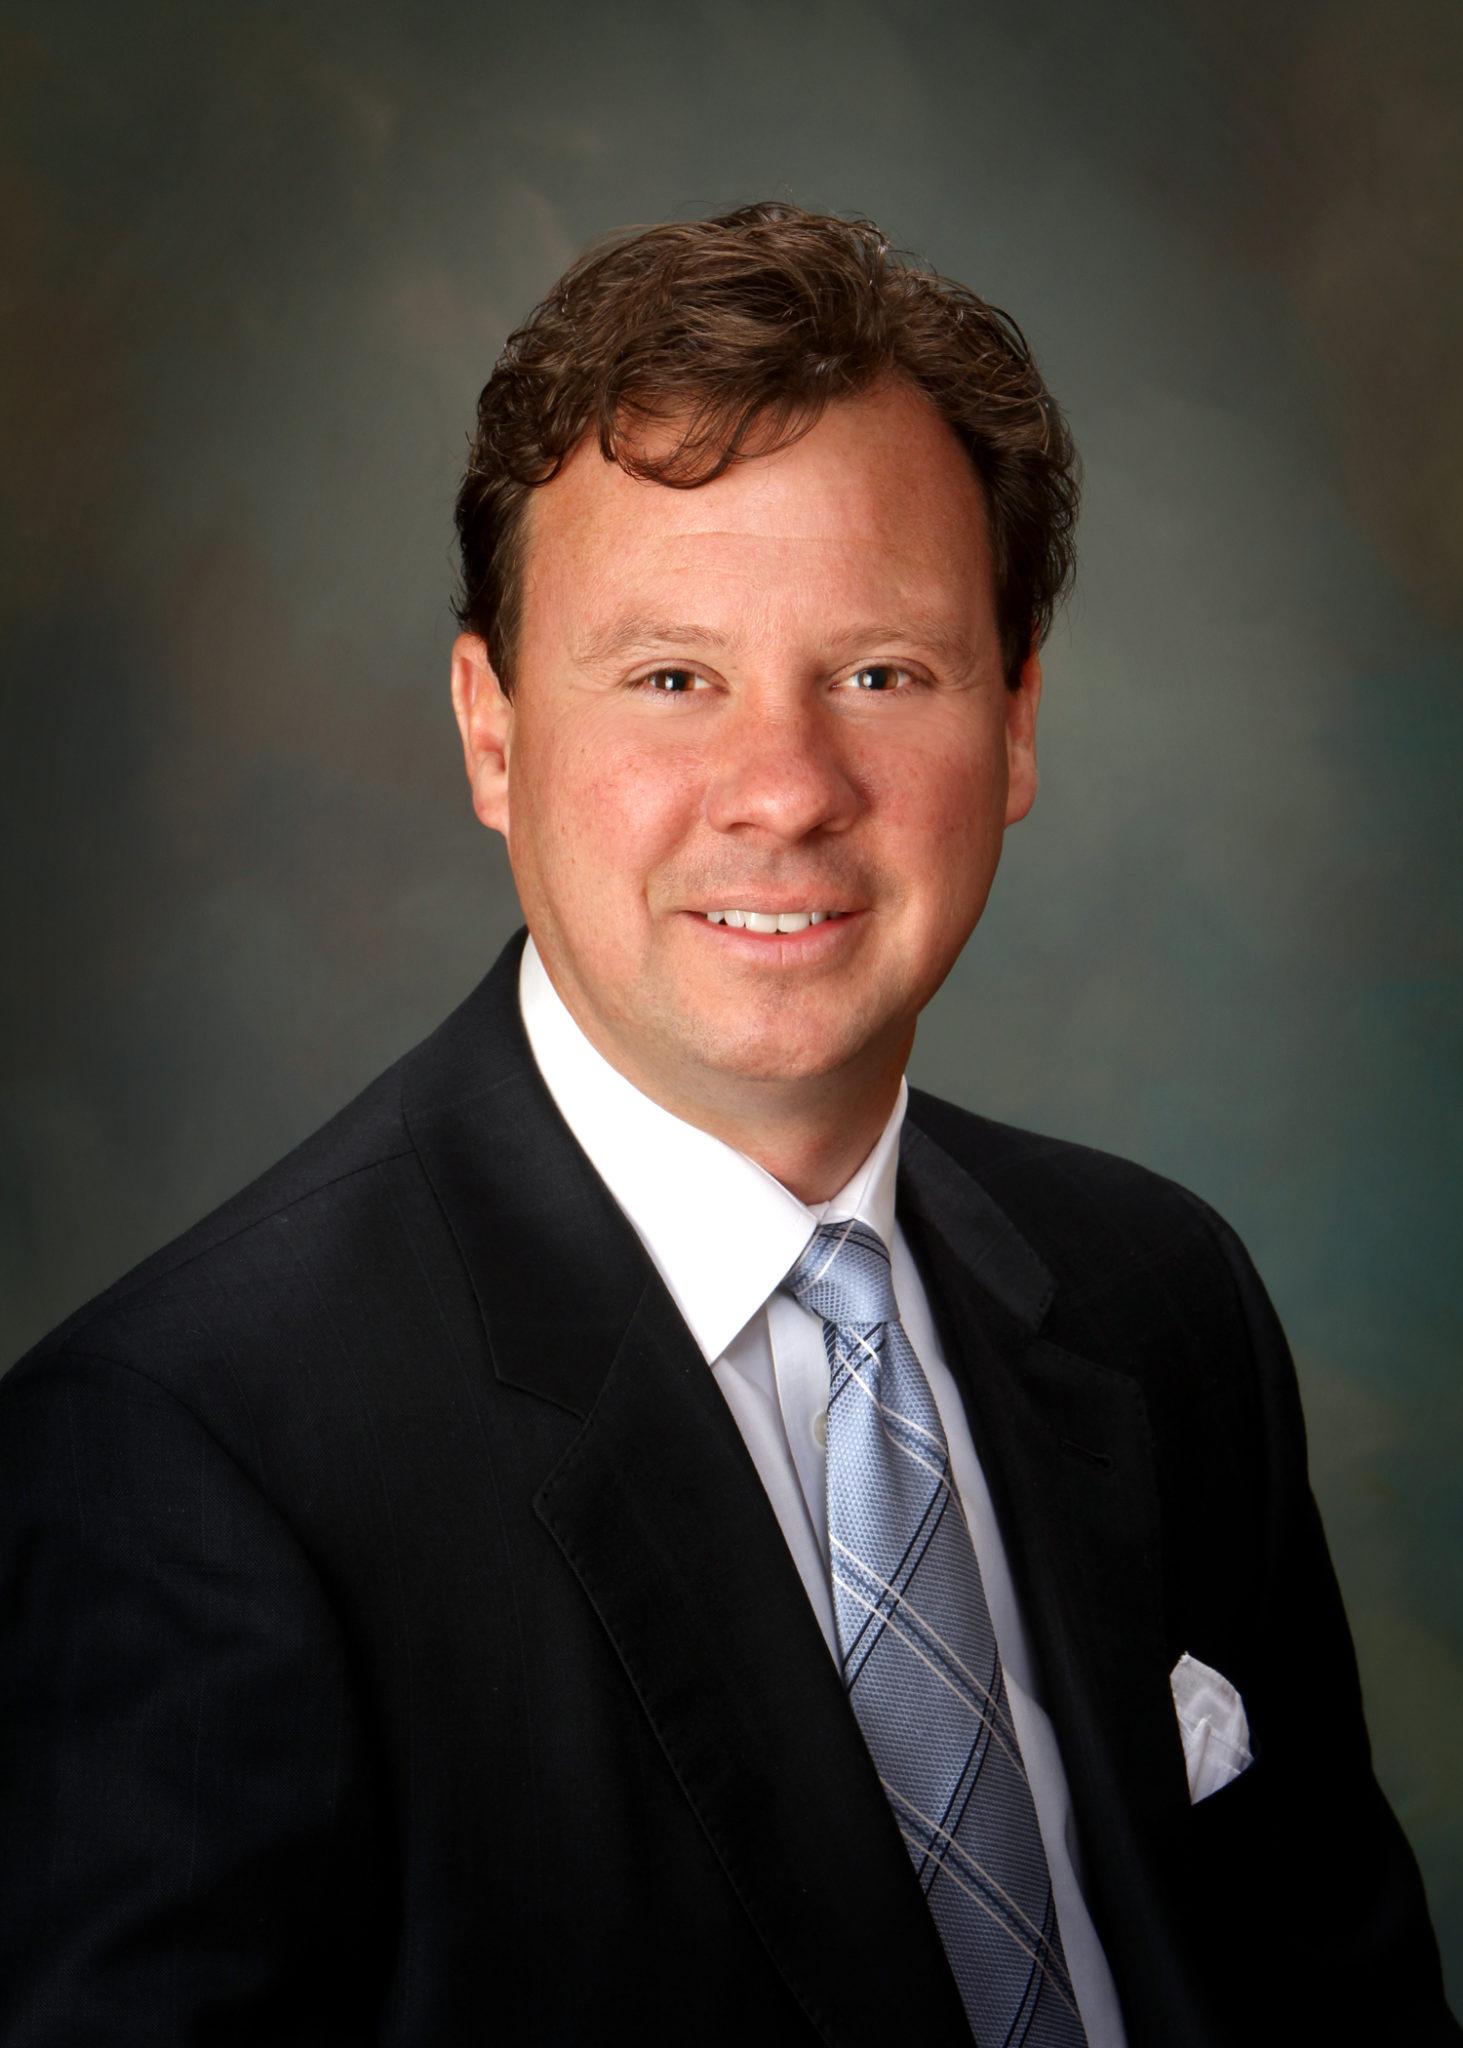 M.L. Bartlett, South Carolina's Family Attorney